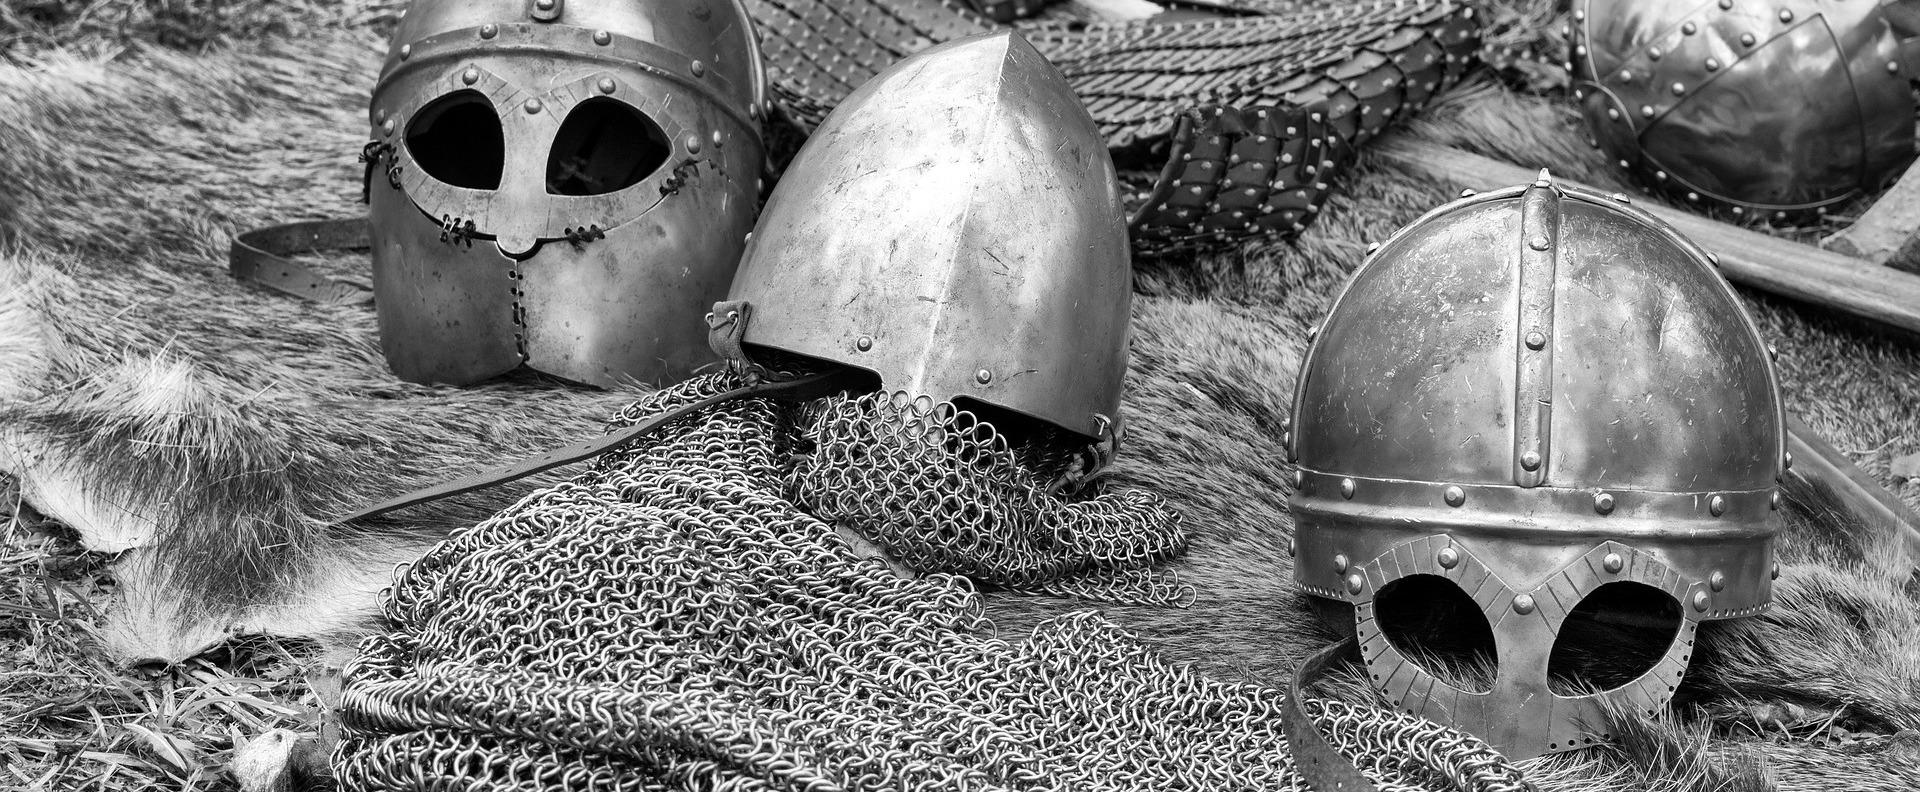 Preparing for Battle in 2017